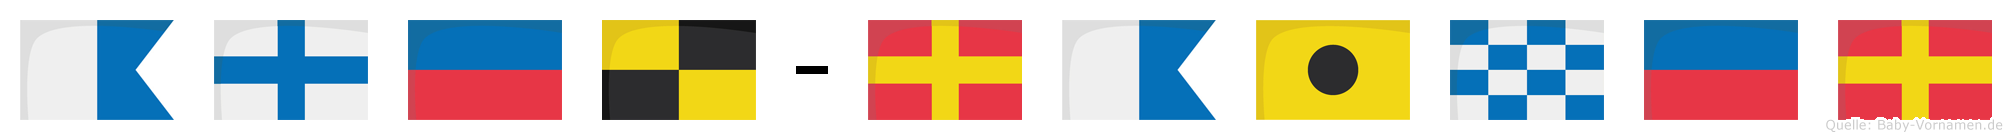 Axel-Rainer im Flaggenalphabet